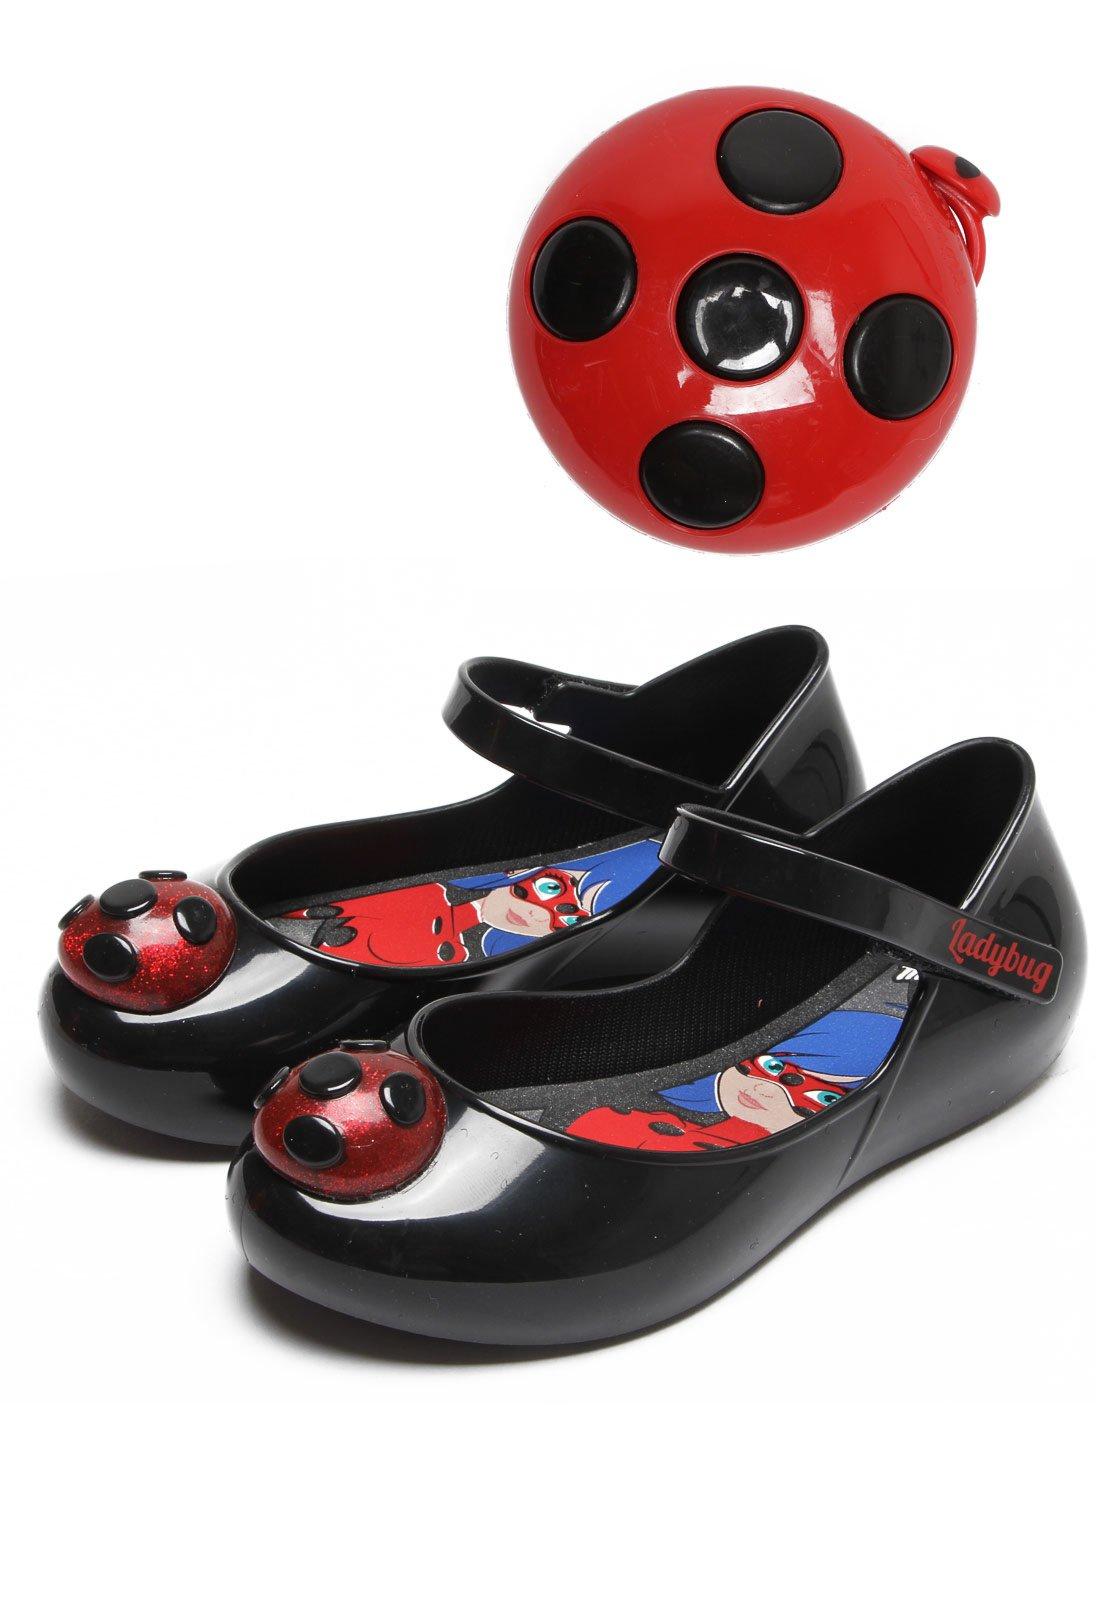 eca846ead5 Sapatilha Grendene Kids Ladybug Miraculous Preto - Compre Agora ...